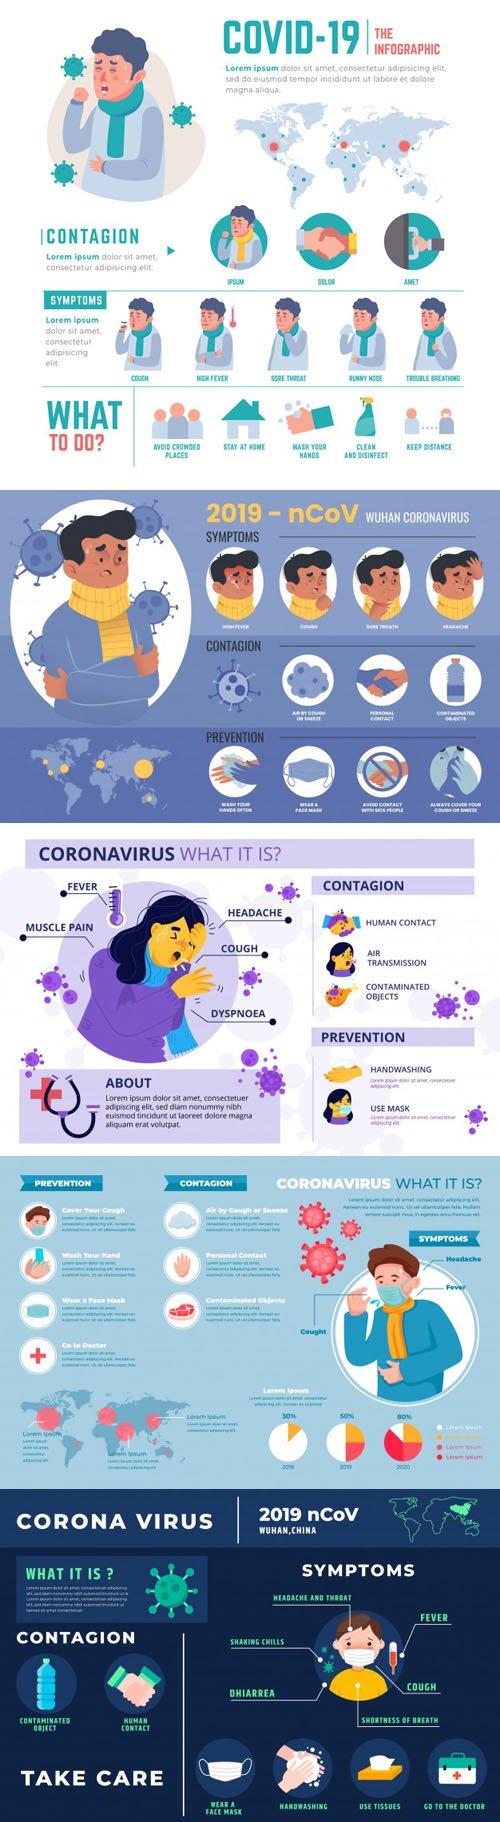 Coronavirus Infographic Vector Set - Protect Yourself Vol.2